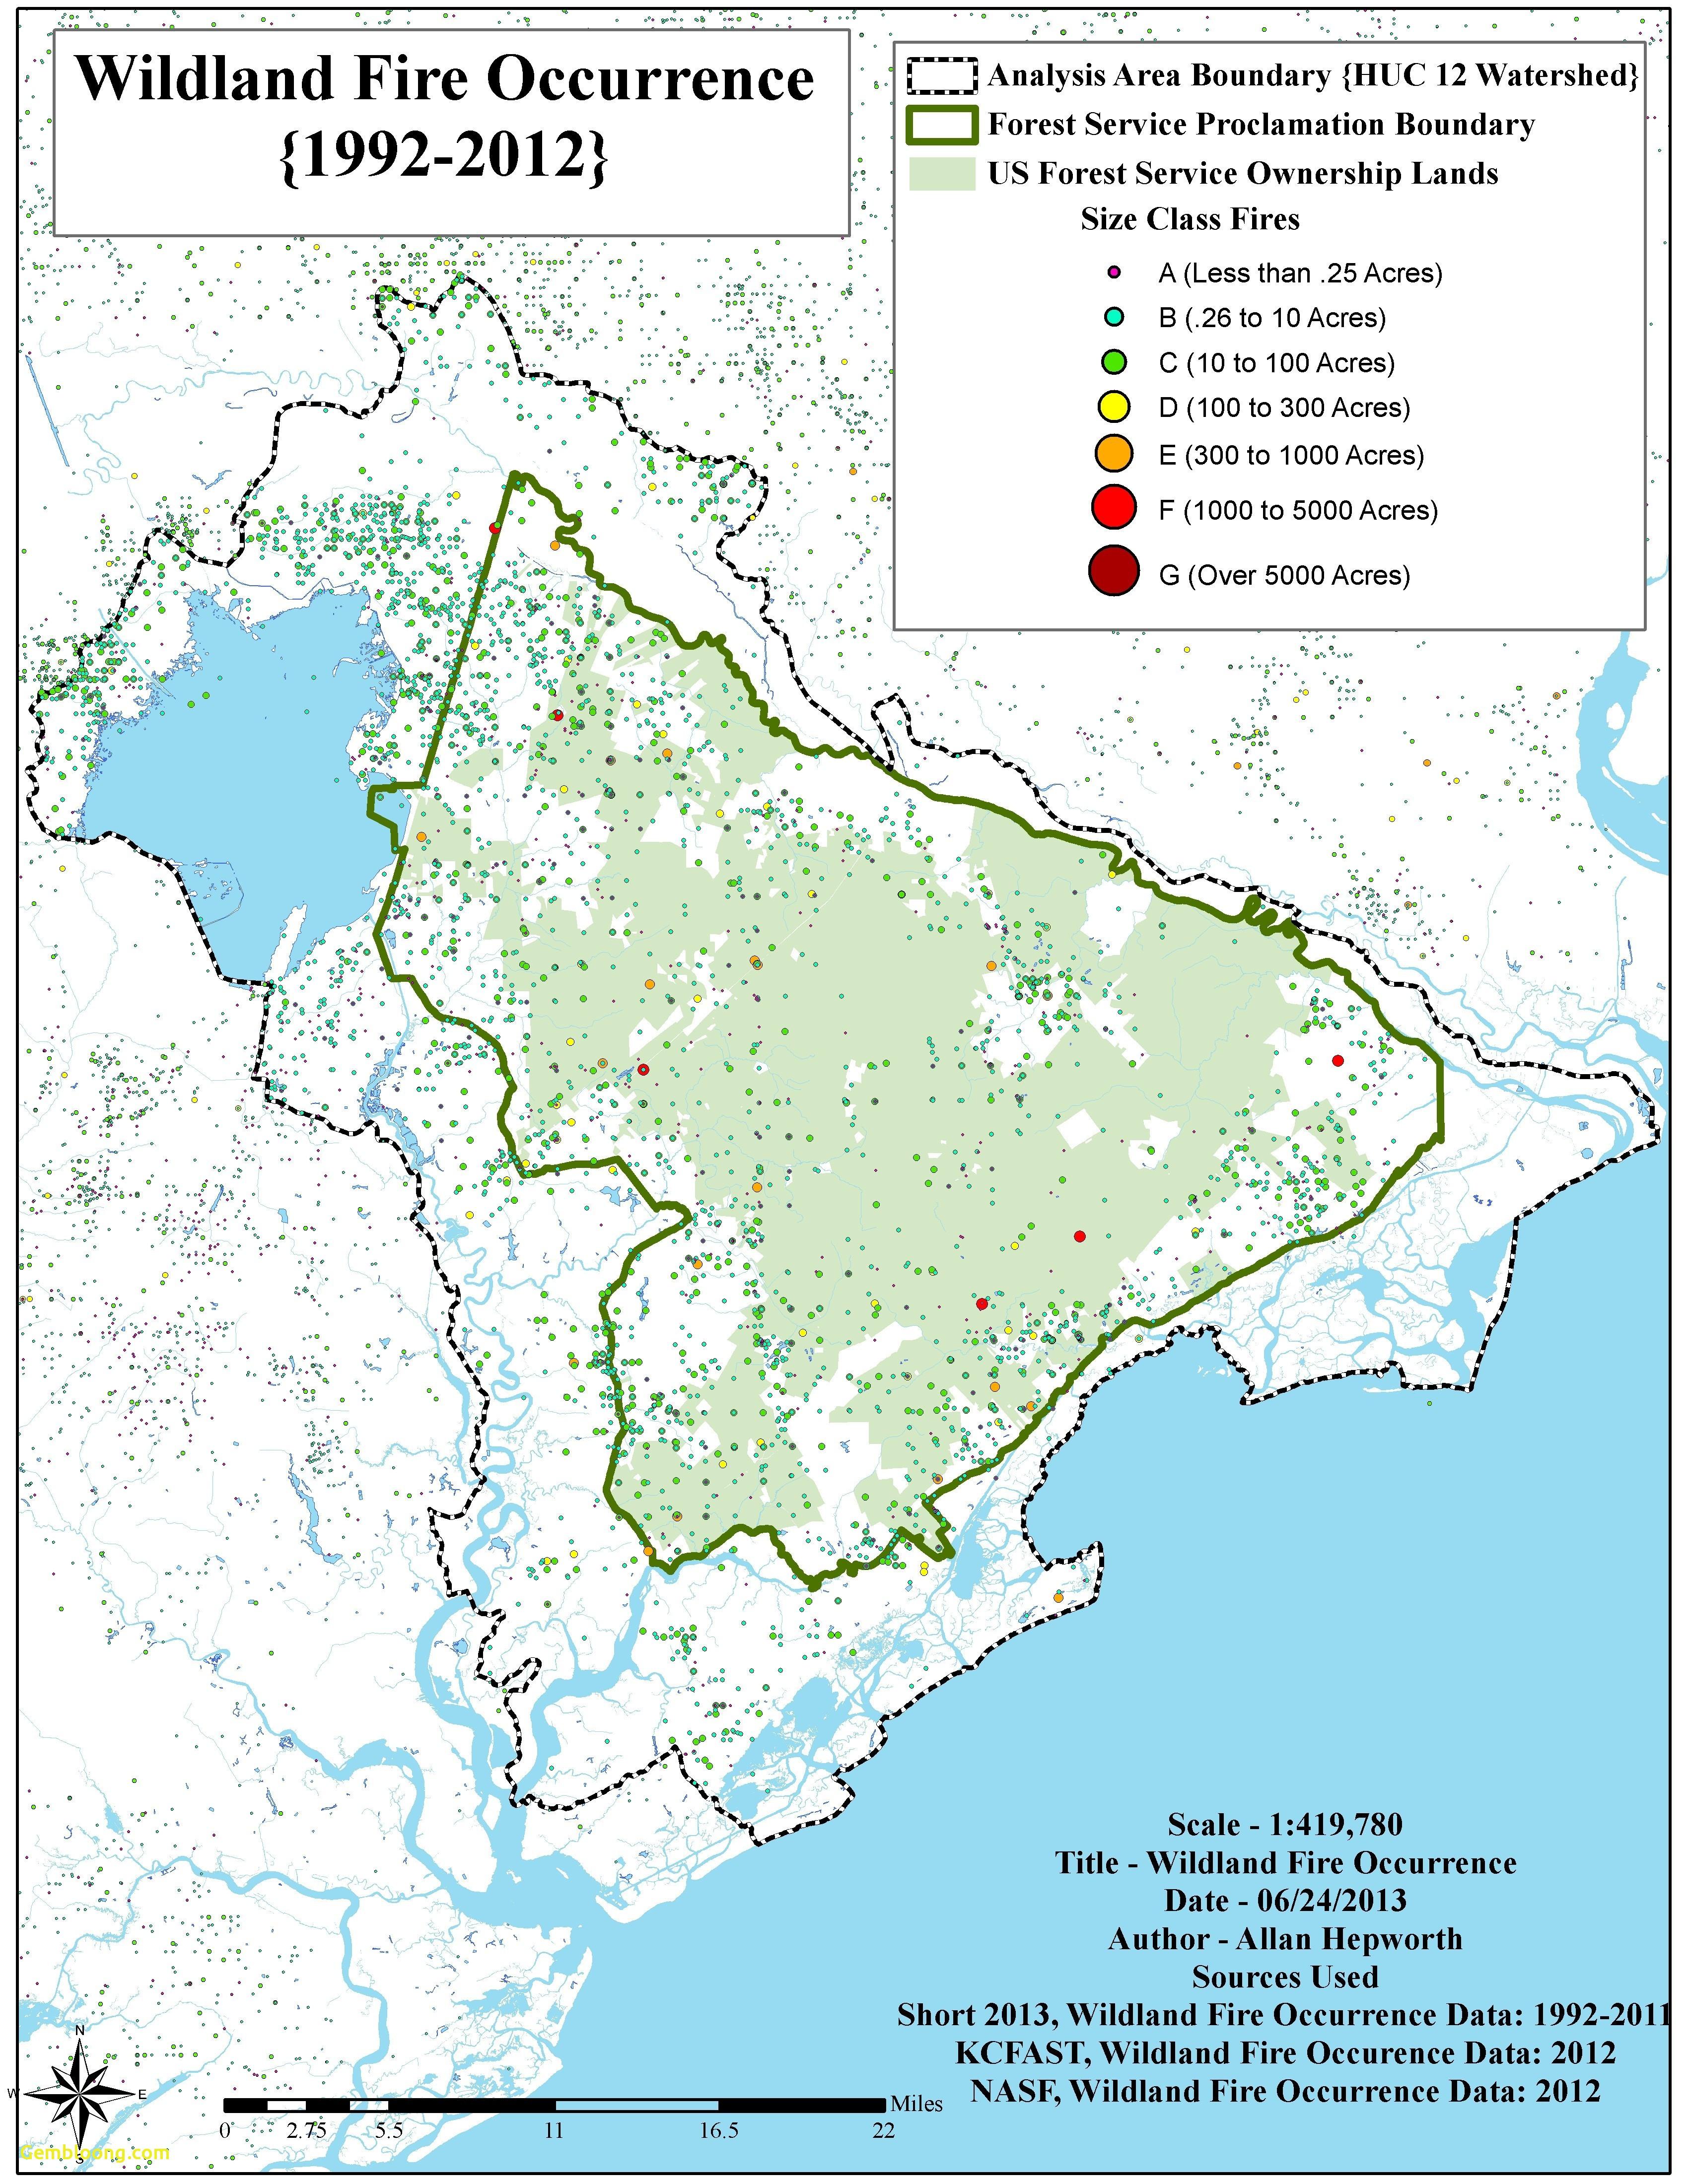 Us East Coast Ski Resorts Map Refrence National Forest Map - California Ski Resorts Map